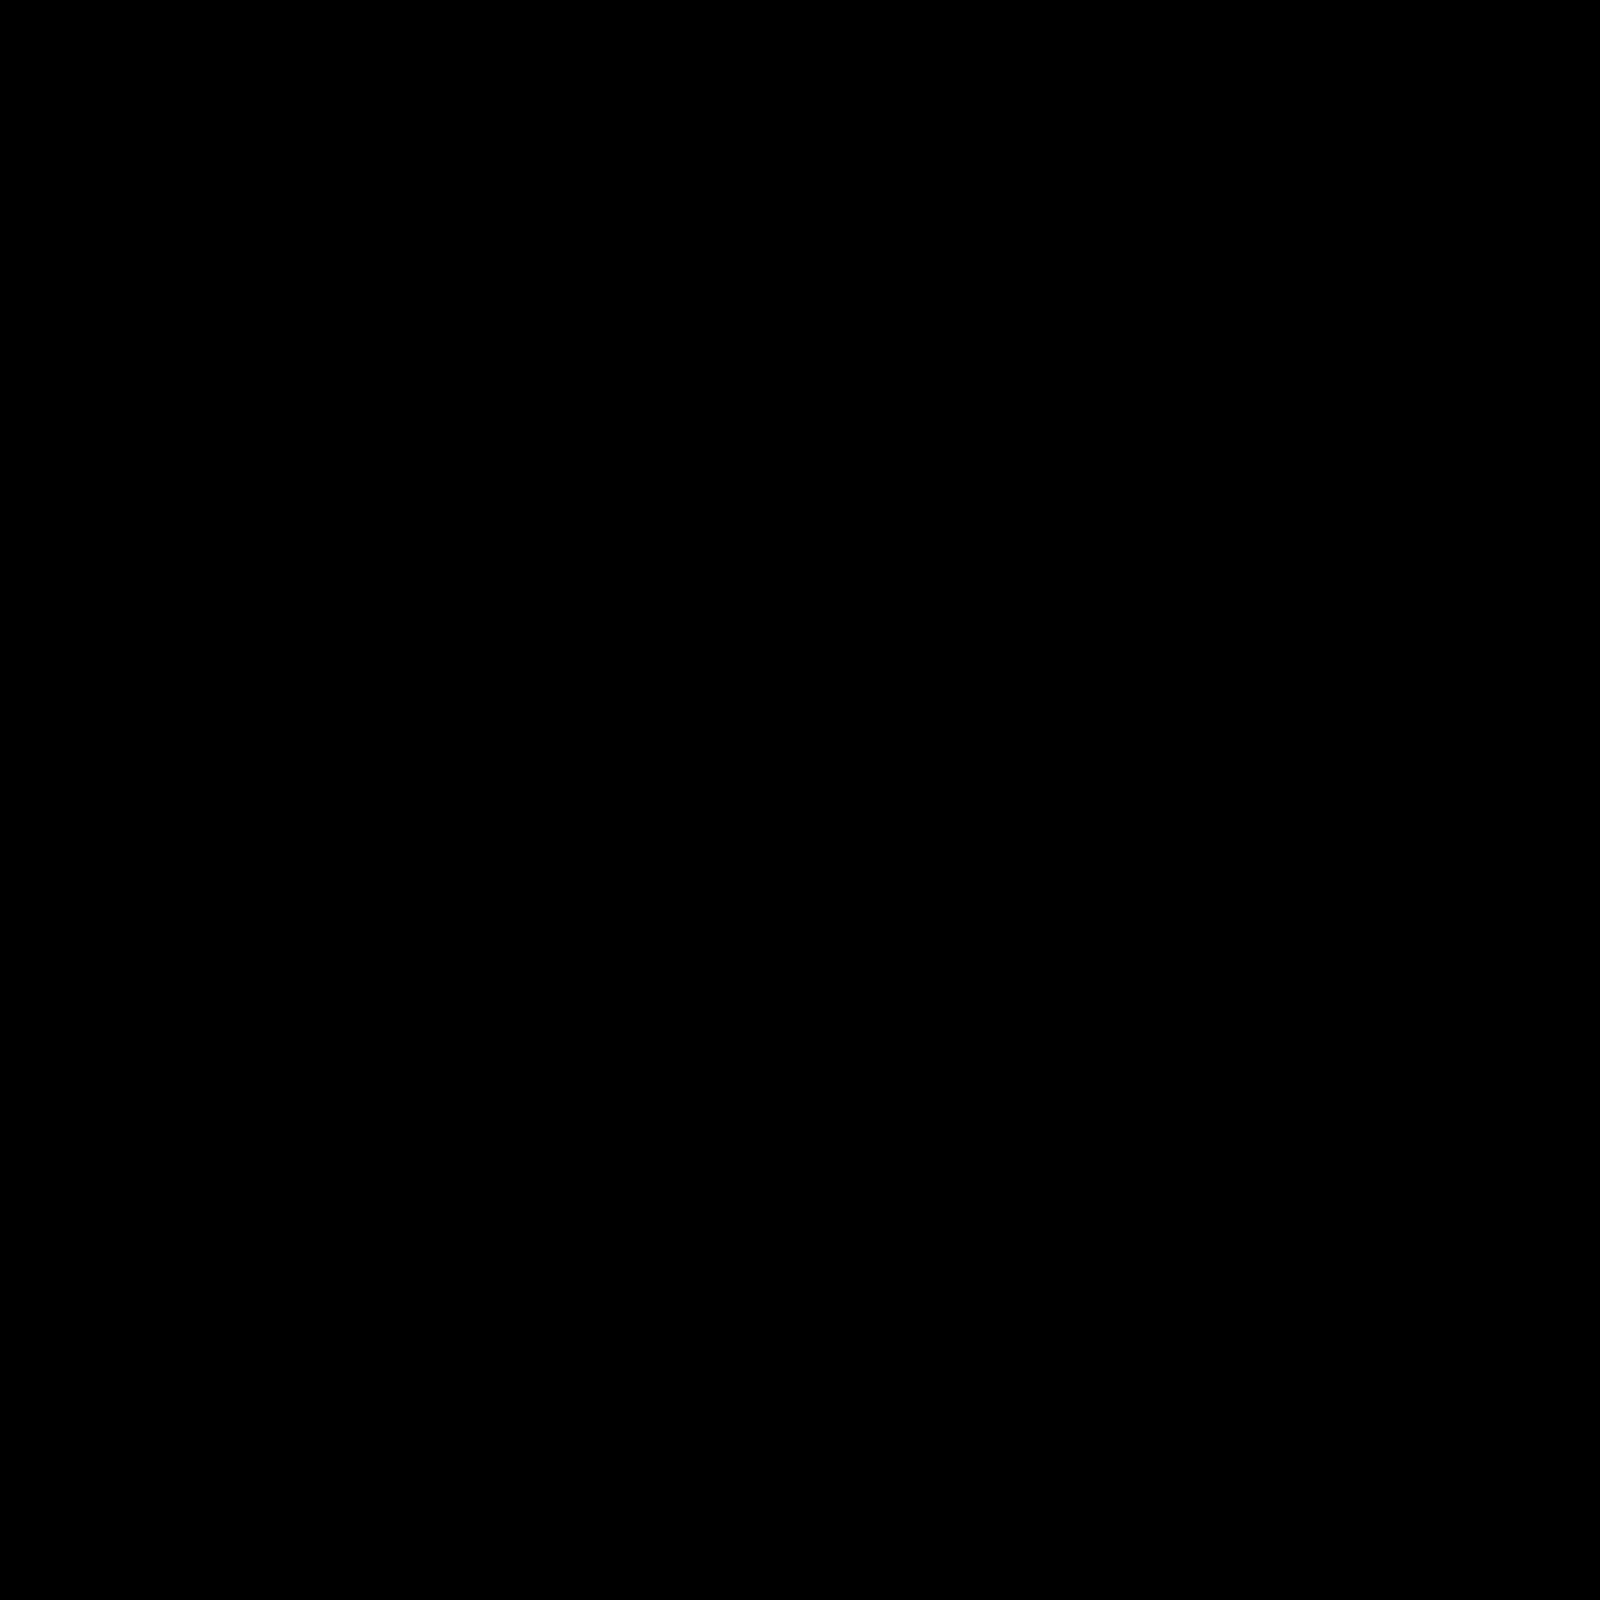 Bandmasters Mace icon